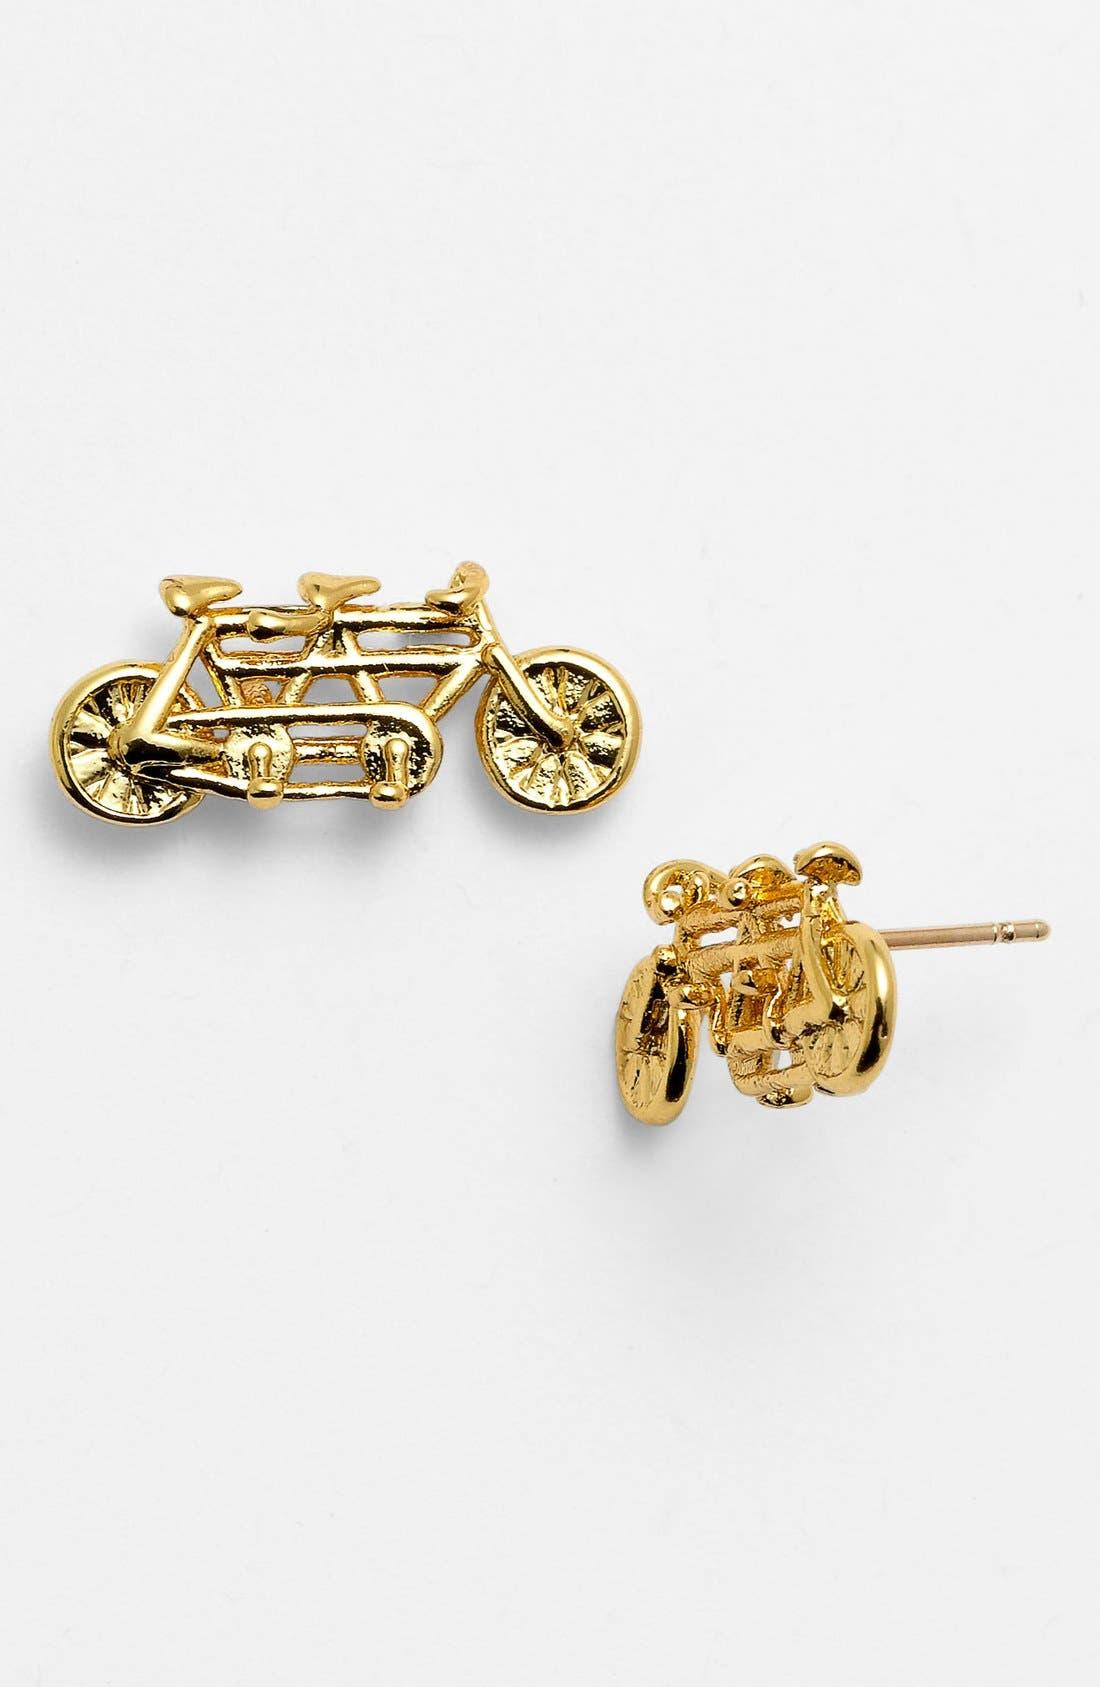 Main Image - kate spade new york 'in tandem' bike stud earrings